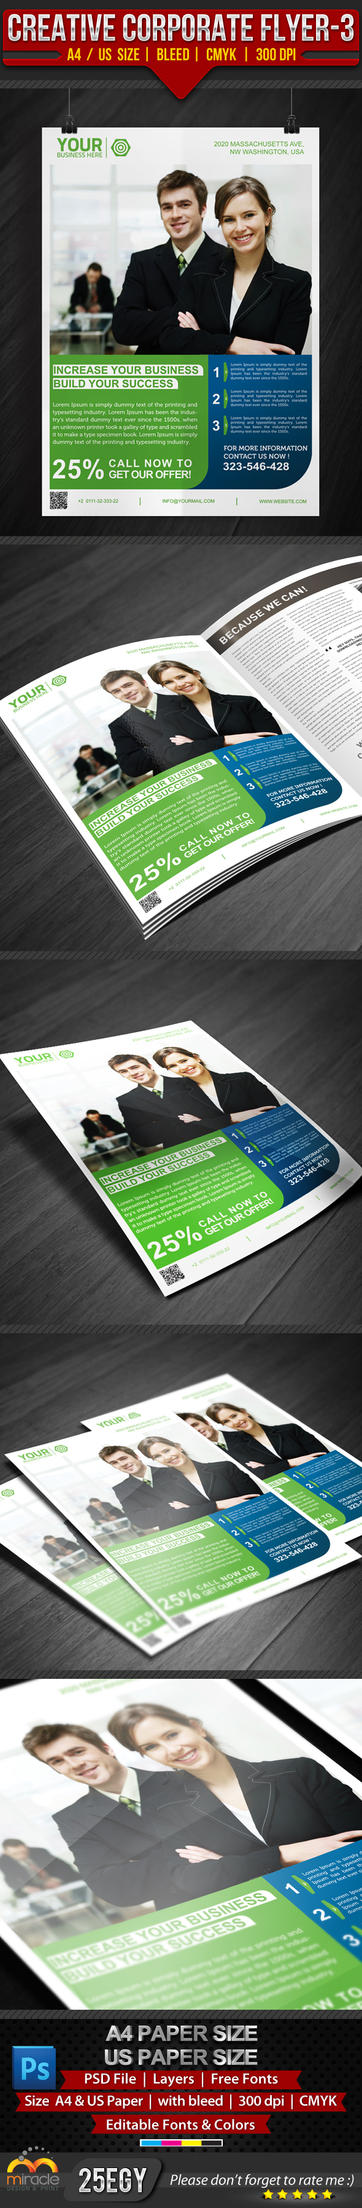 Creative Corporate Flyer 3 by EgYpToS